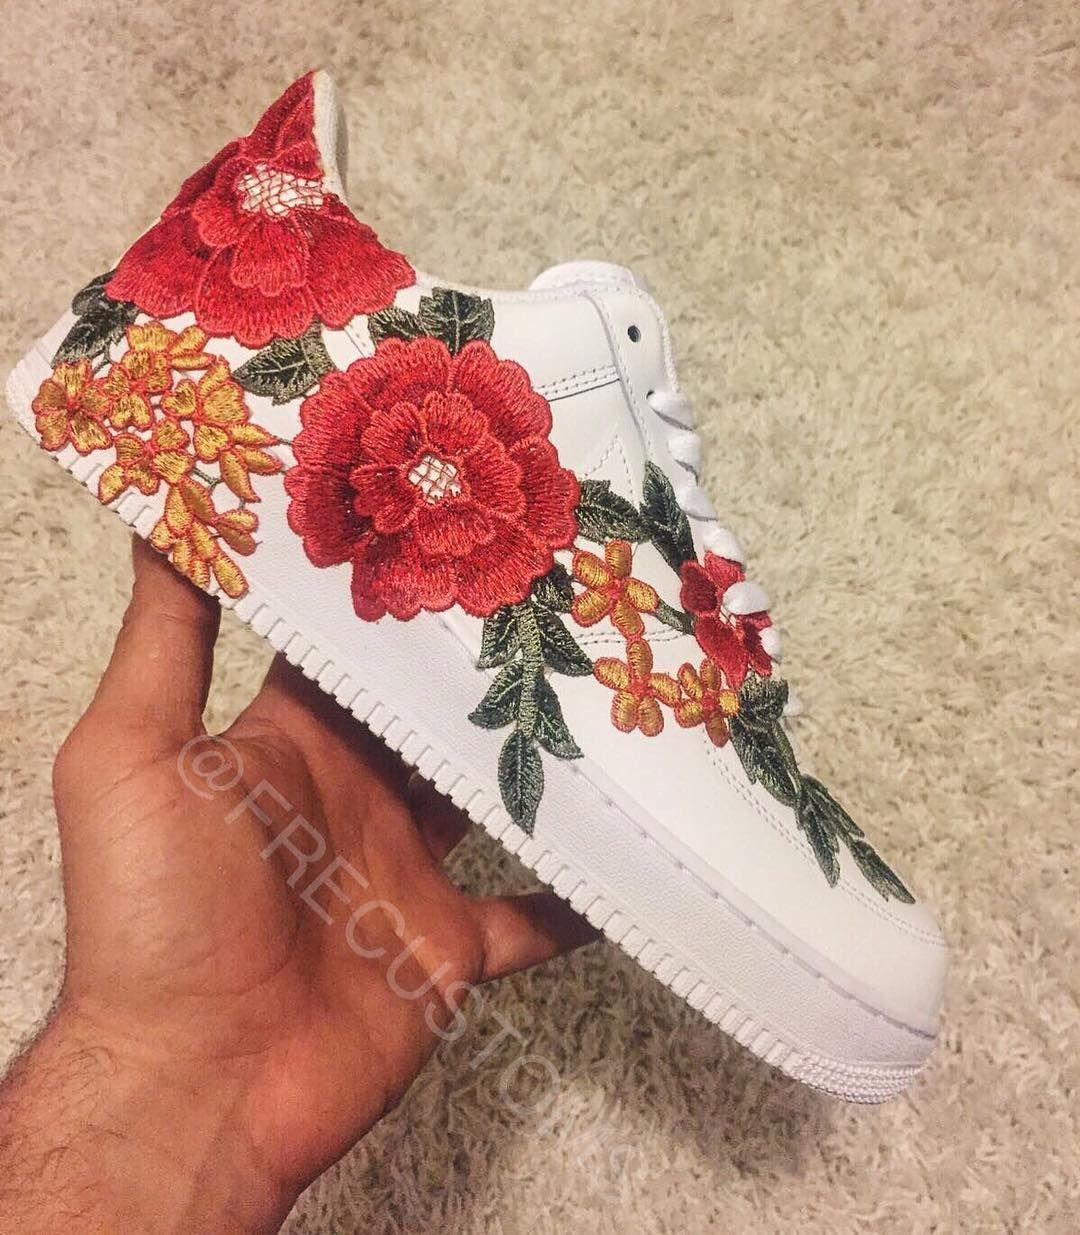 b0f4b83817b207 The Custom Nike Air Force 1  Flowerbomb  Is Pure Fire